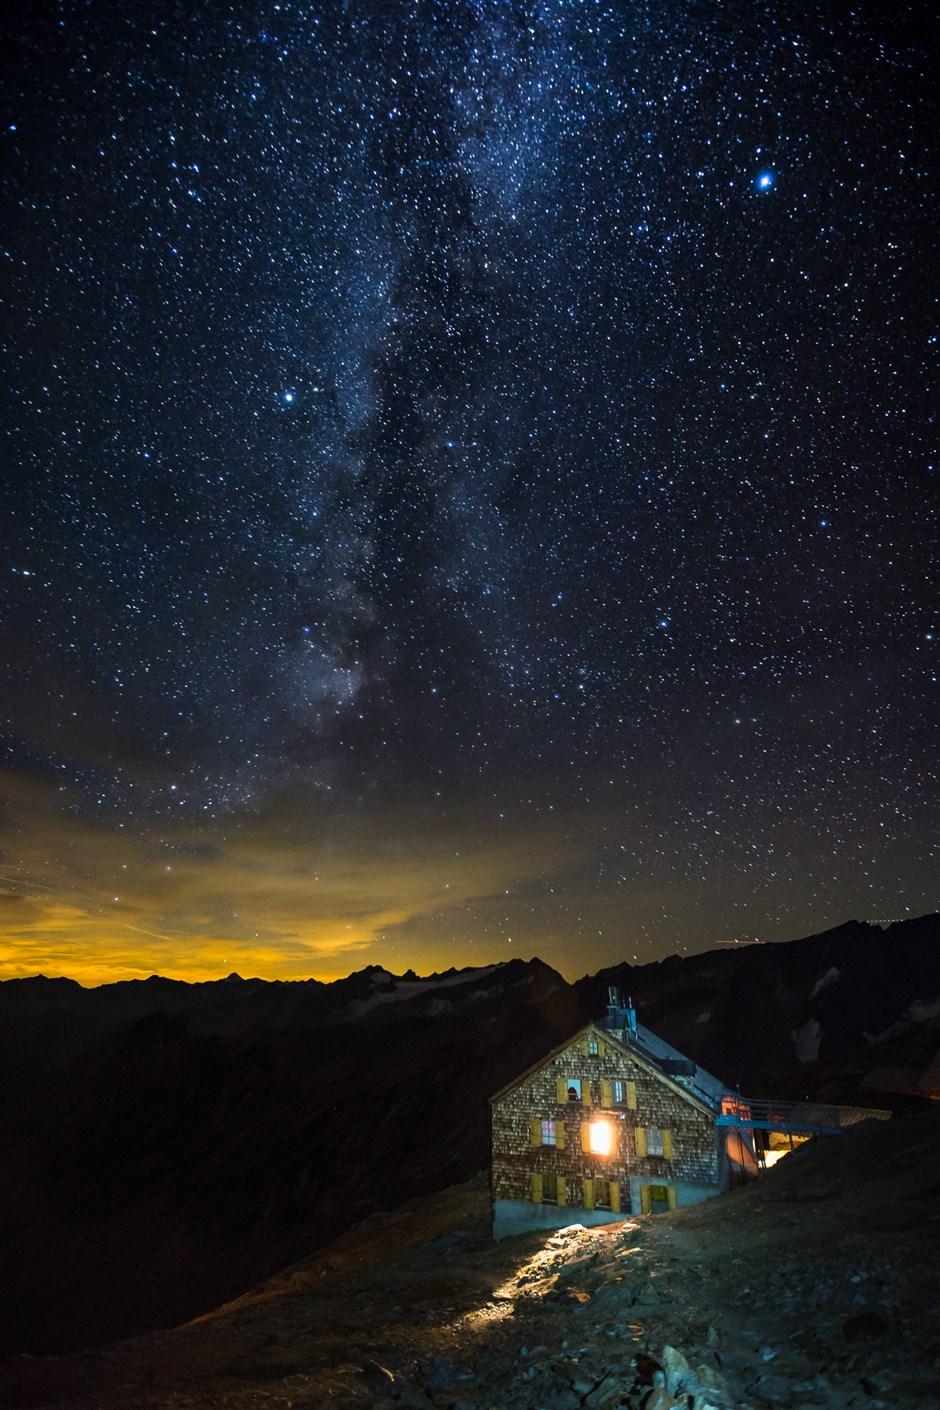 Sternenhimmel über dem Defreggerhaus